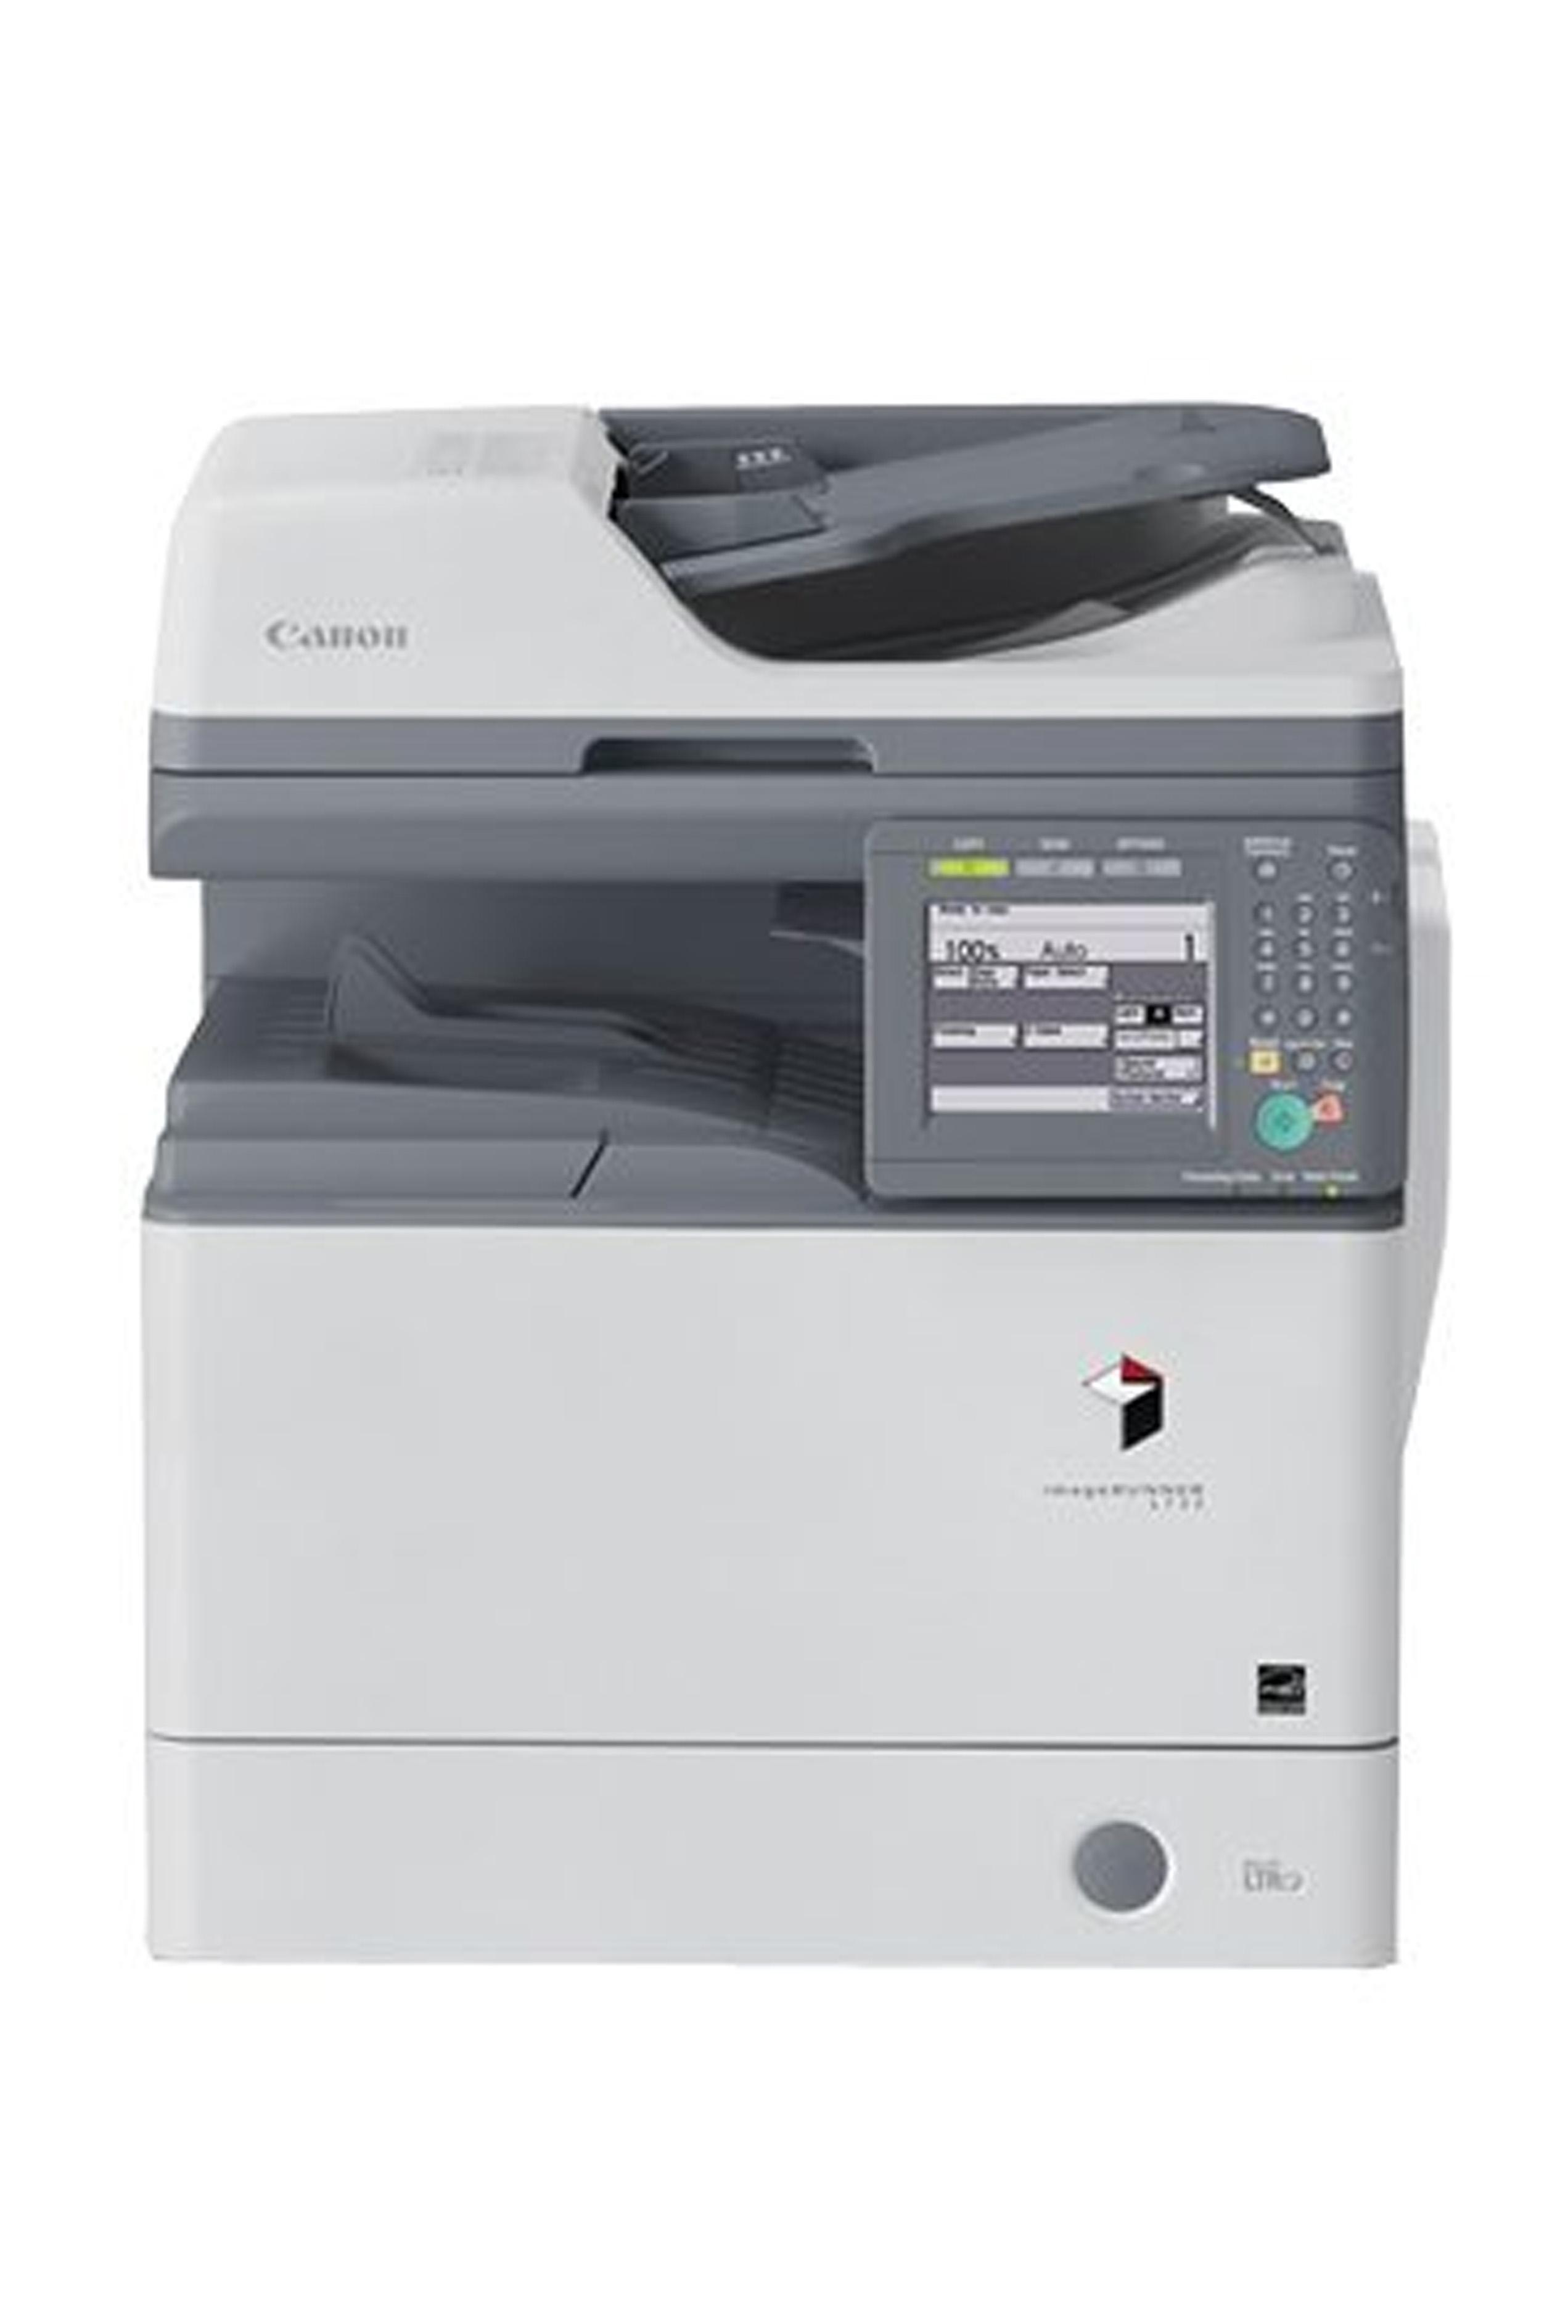 Canon imageRUNNER 1730iF (32ppm)